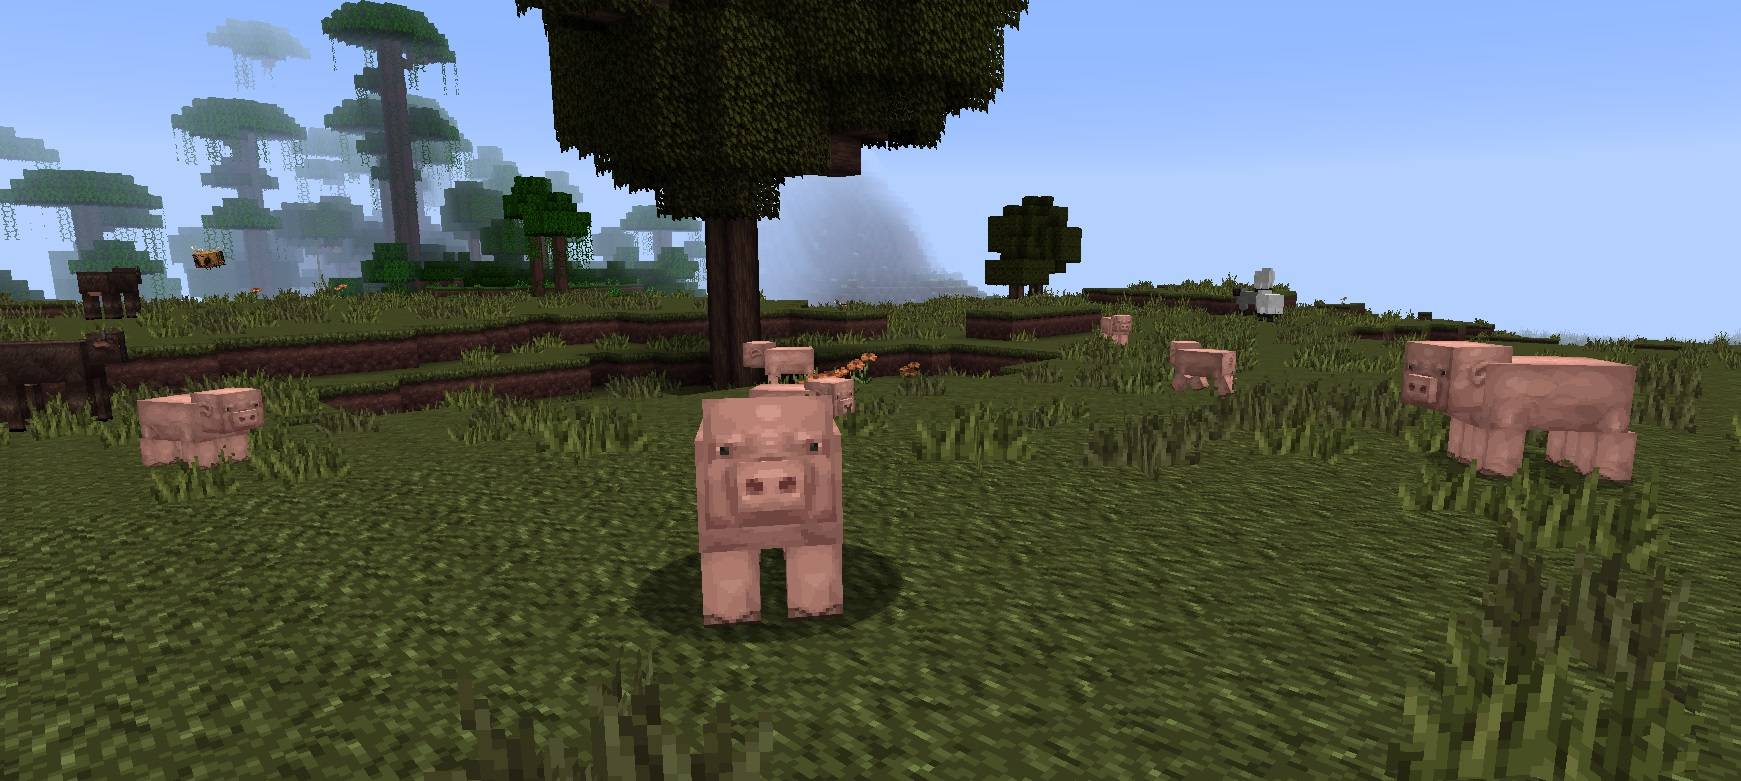 MYTHIC paczka tekstur zasobow 1.15 swinka